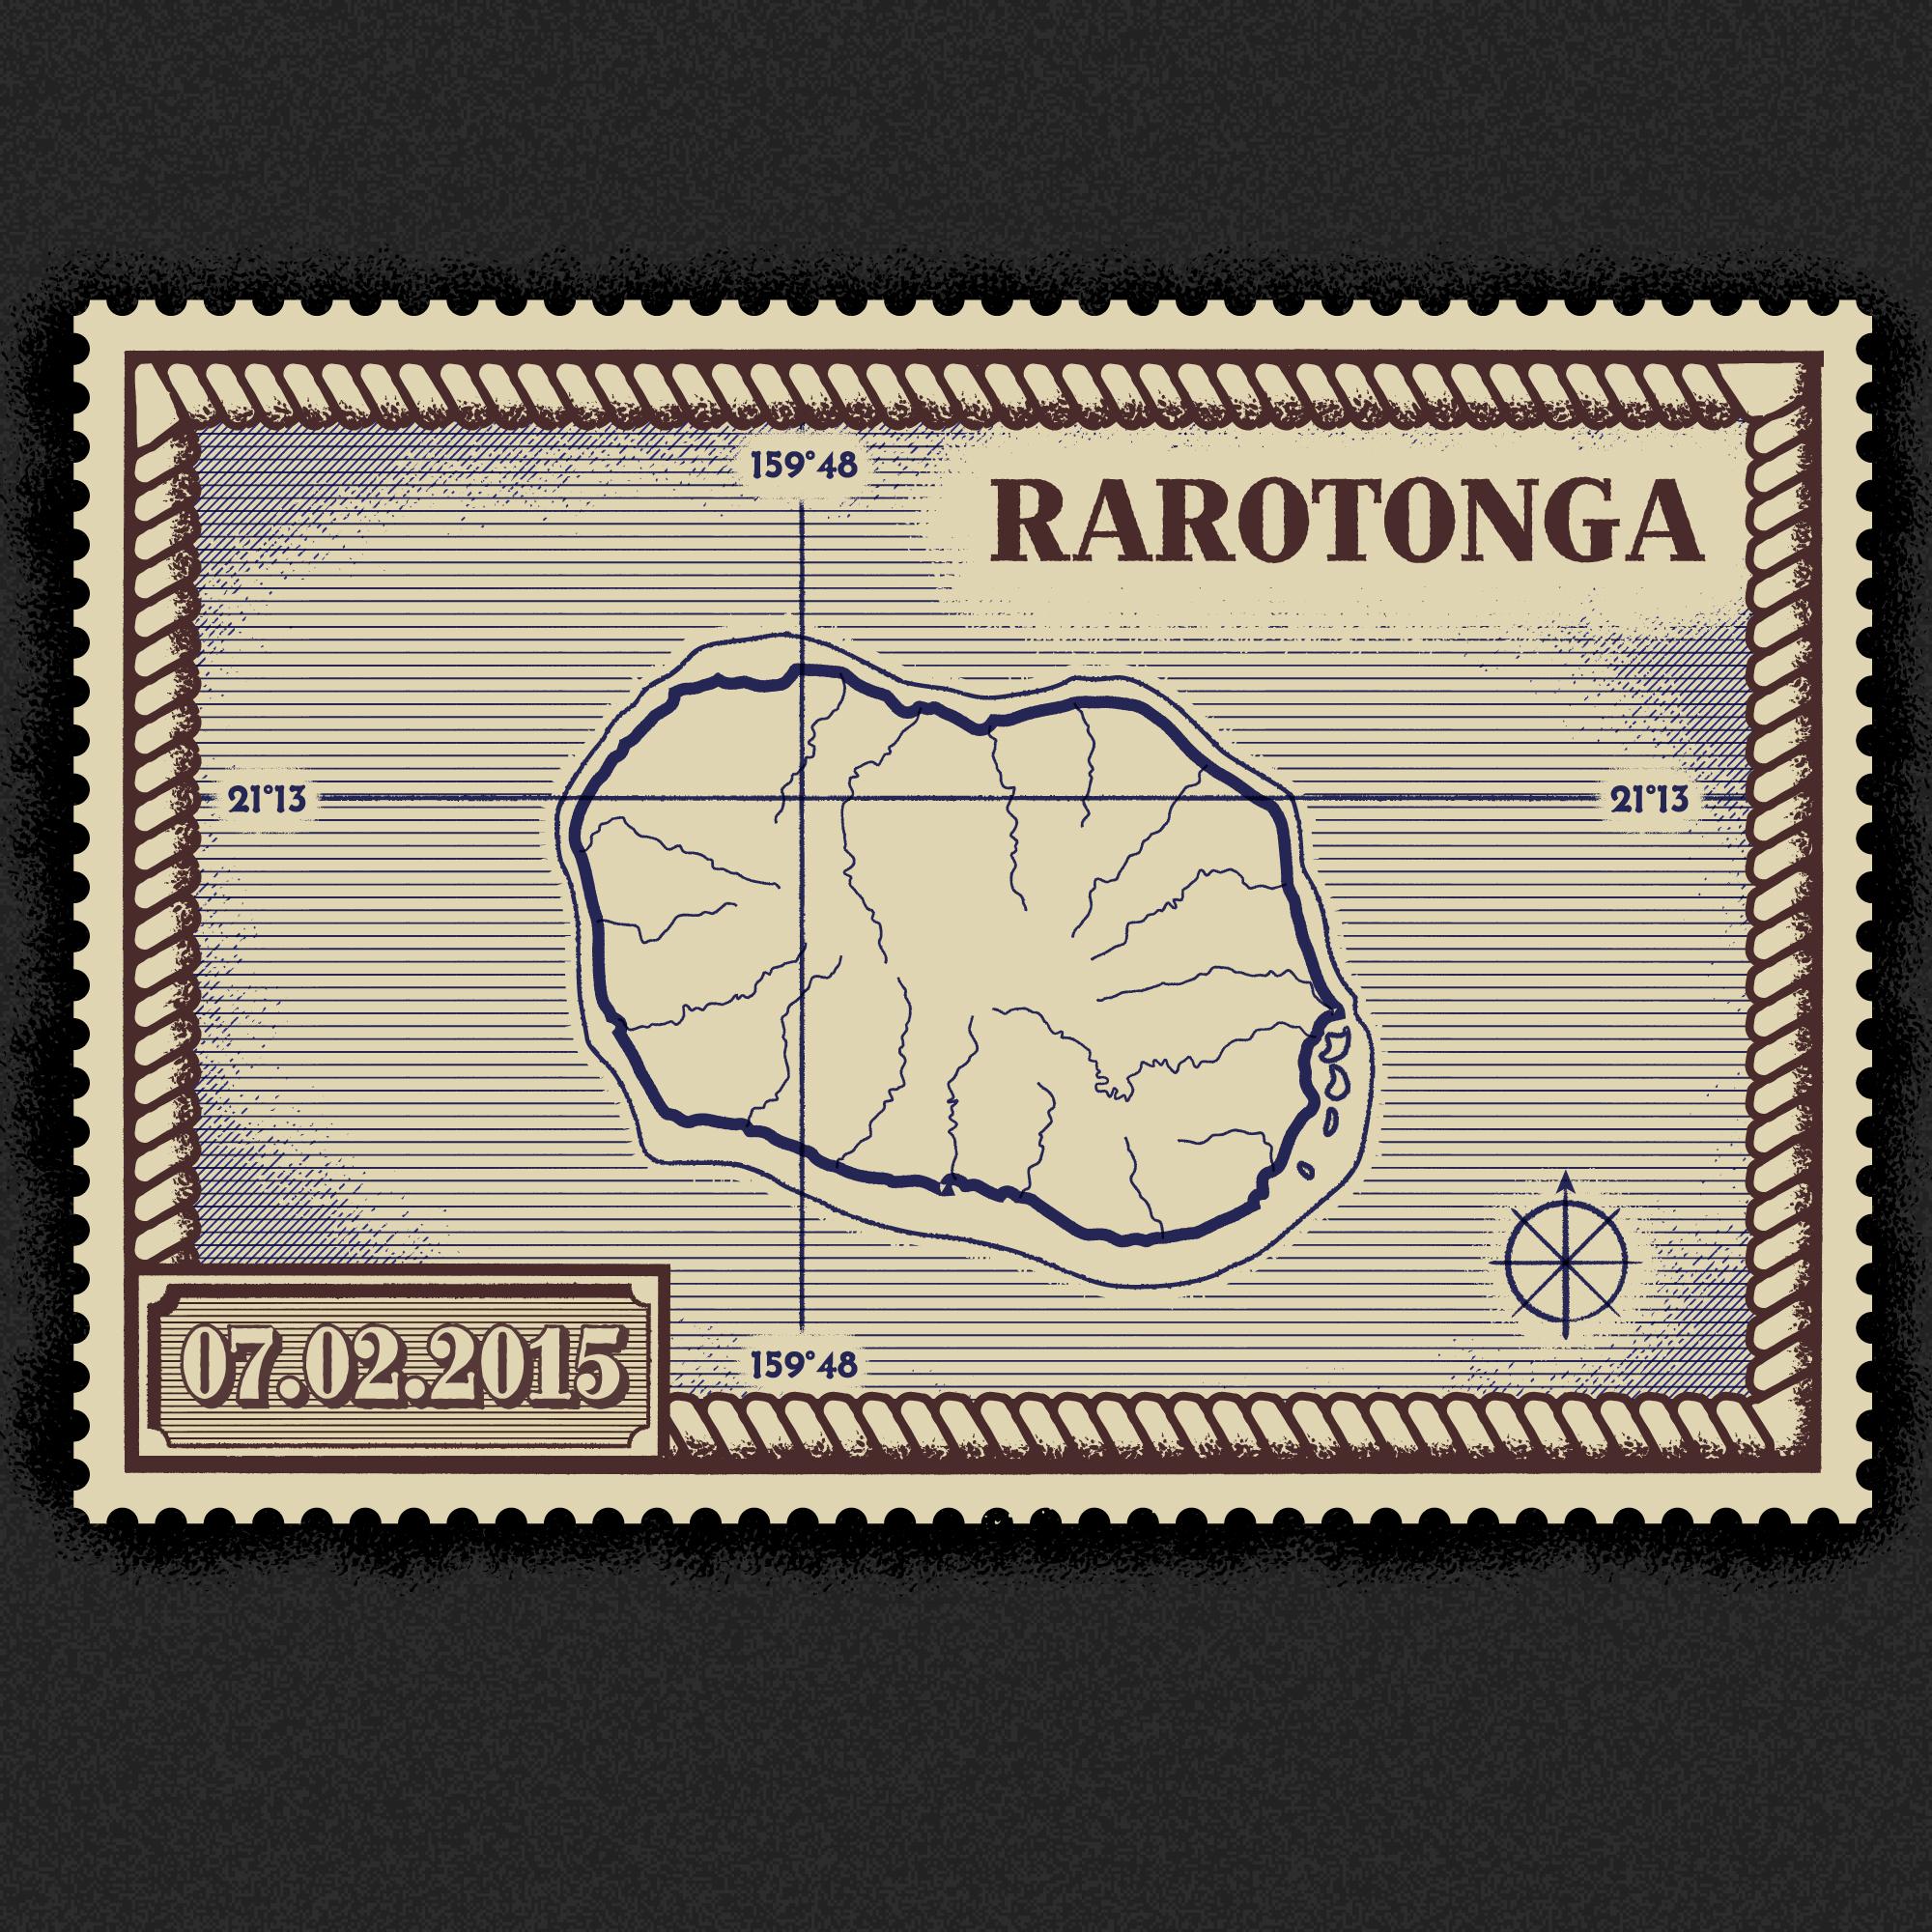 Vintage Rarotonga map stamp